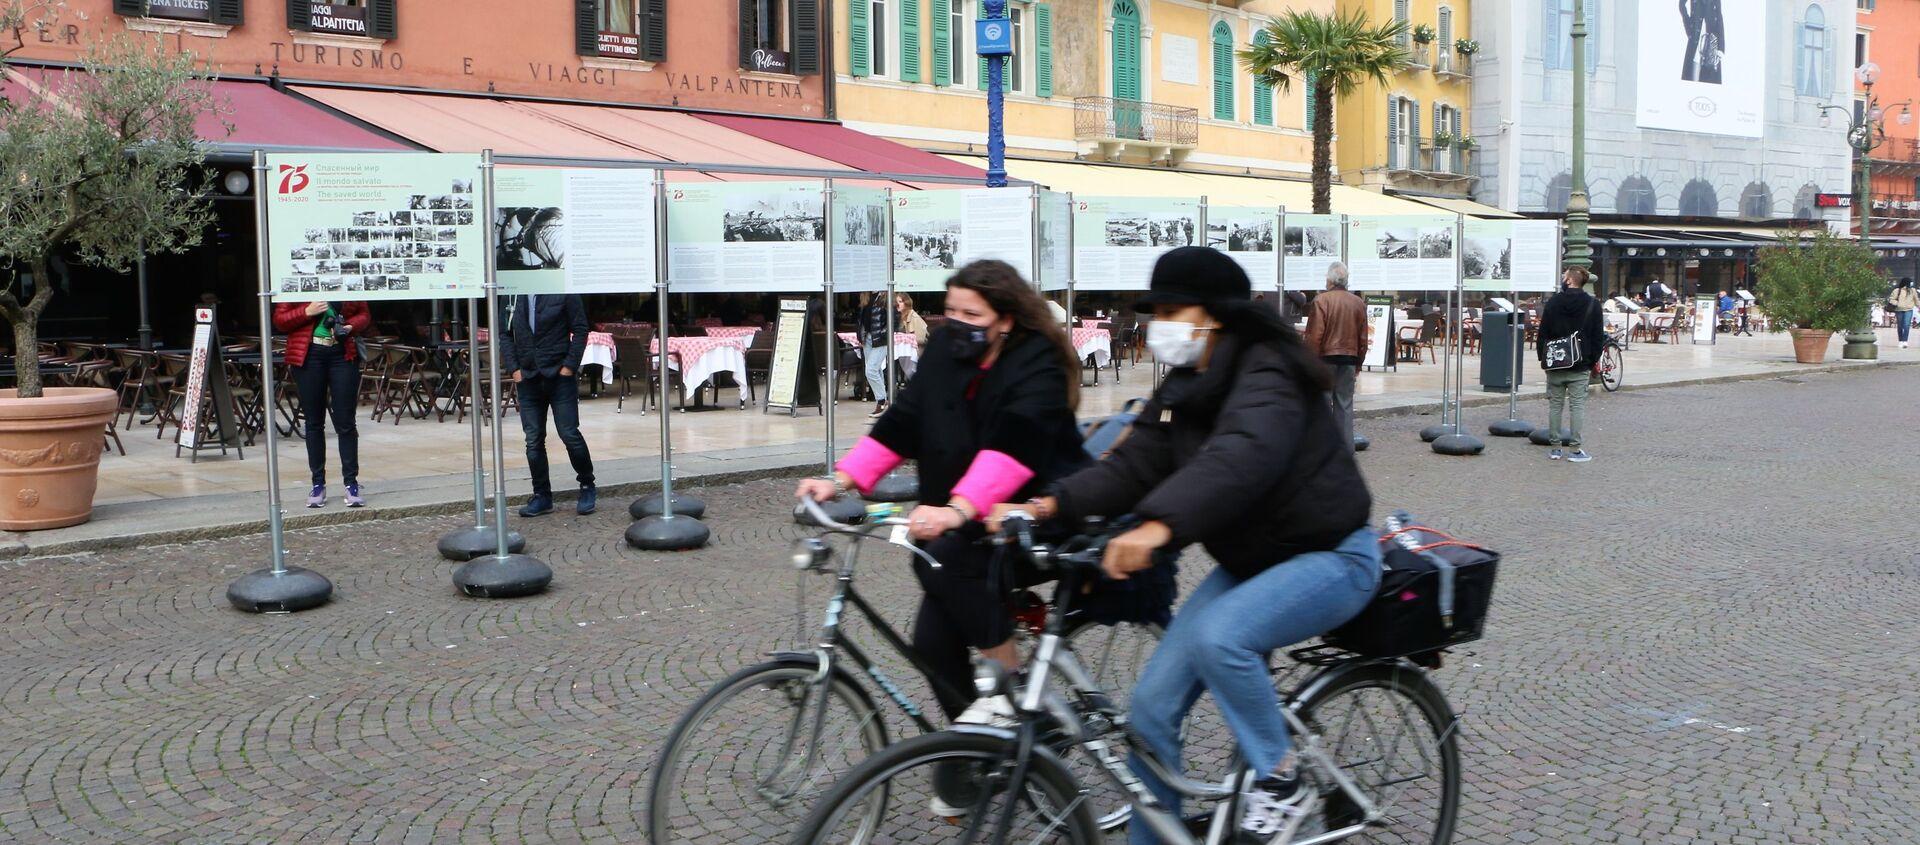 Italia biciclette - Sputnik Italia, 1920, 13.04.2021